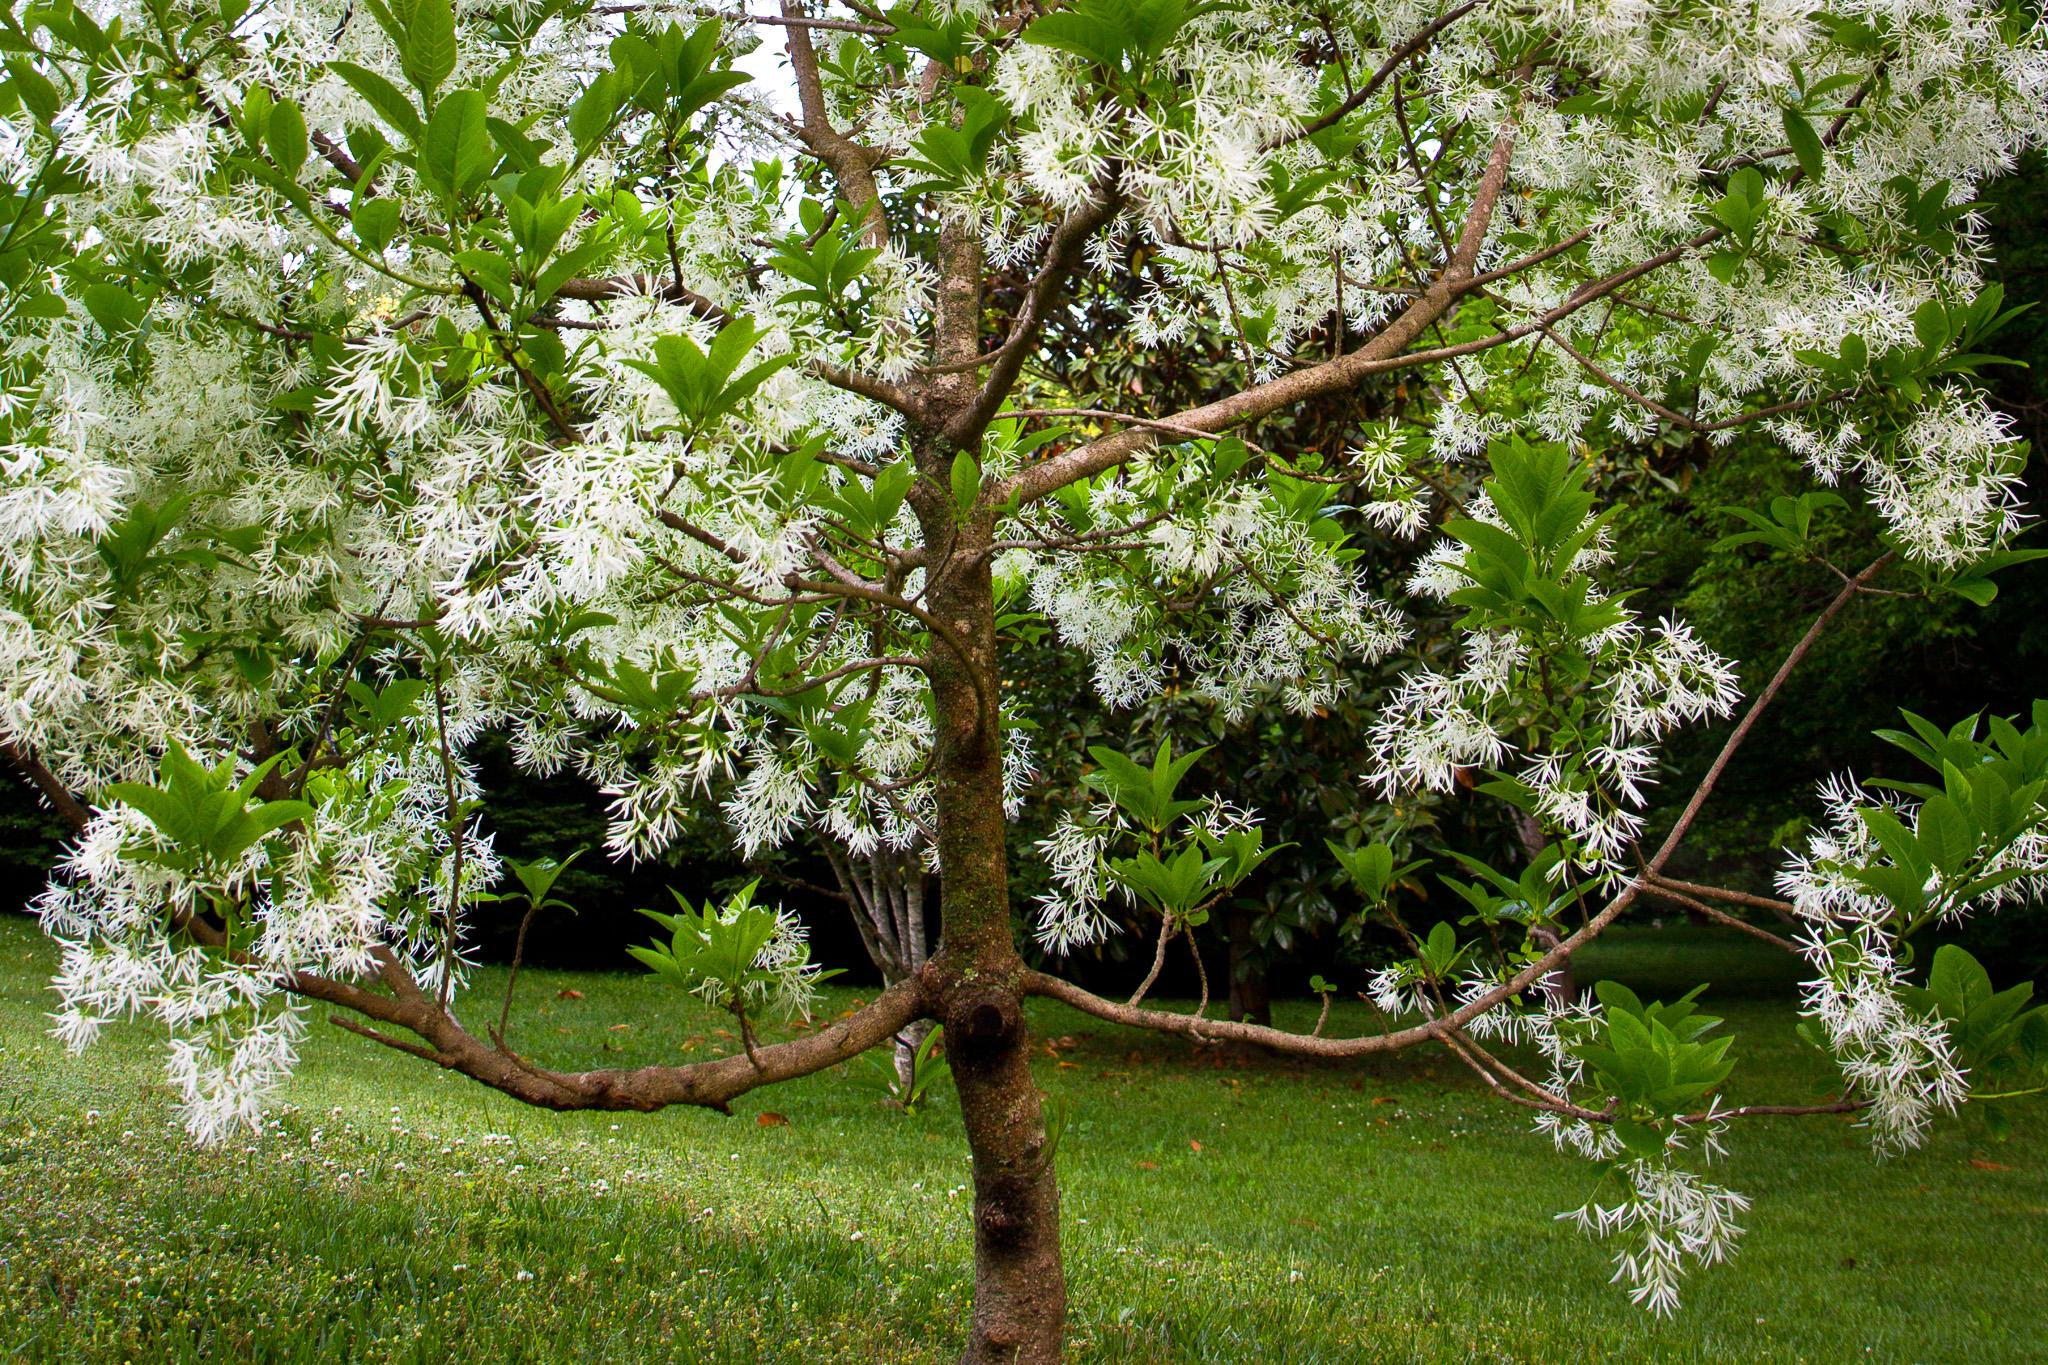 The fringe tree (Chionanthus virginicus)